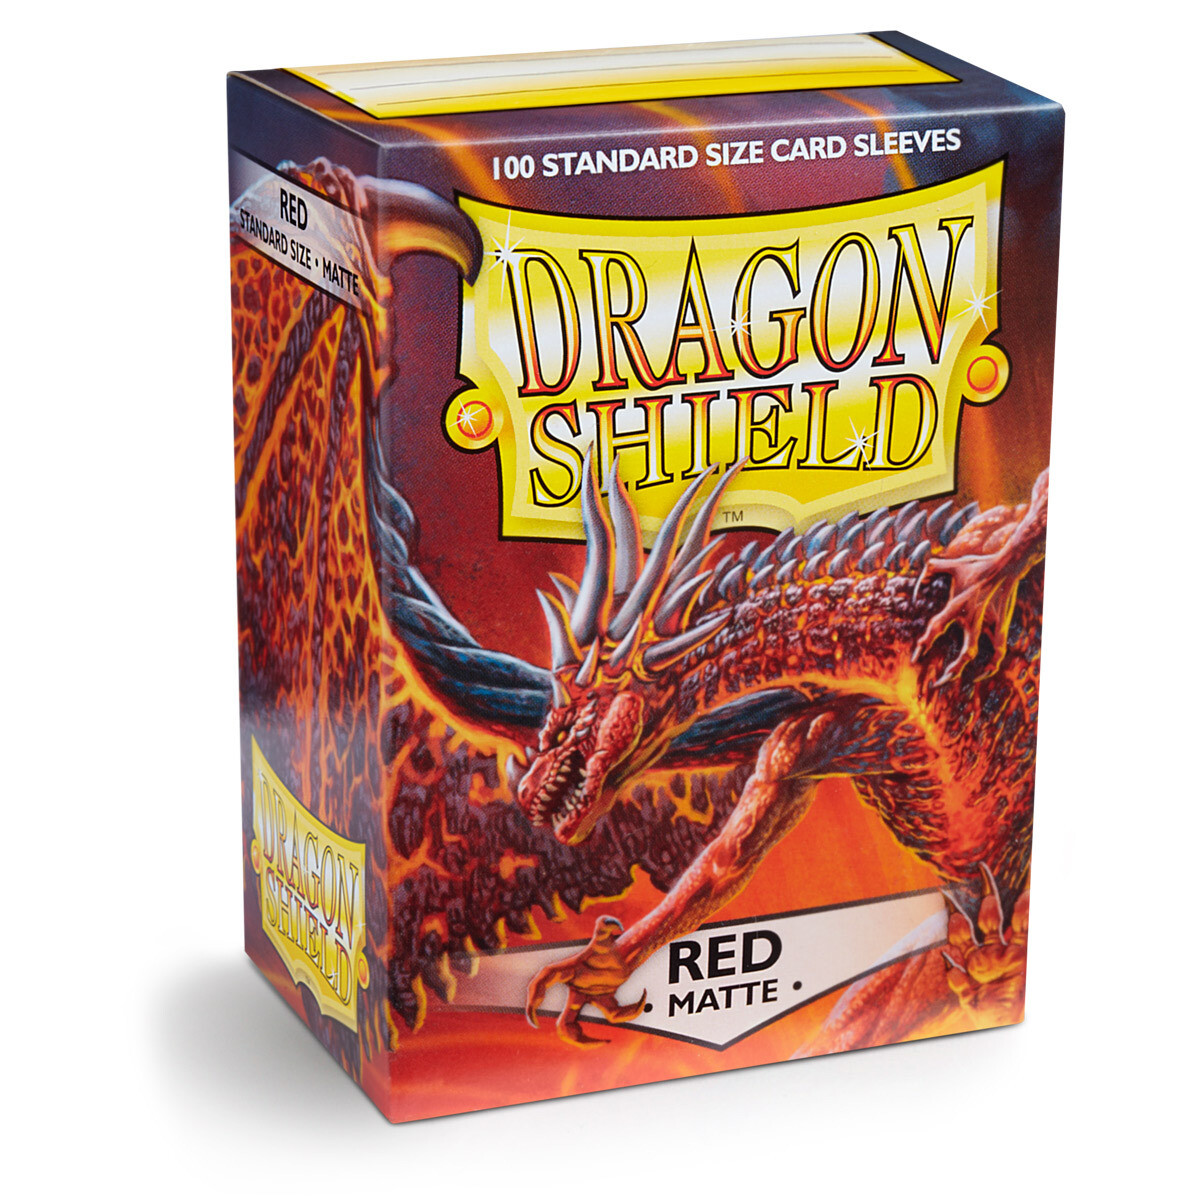 Dragon Shield 100 Sleeves - Matte Red